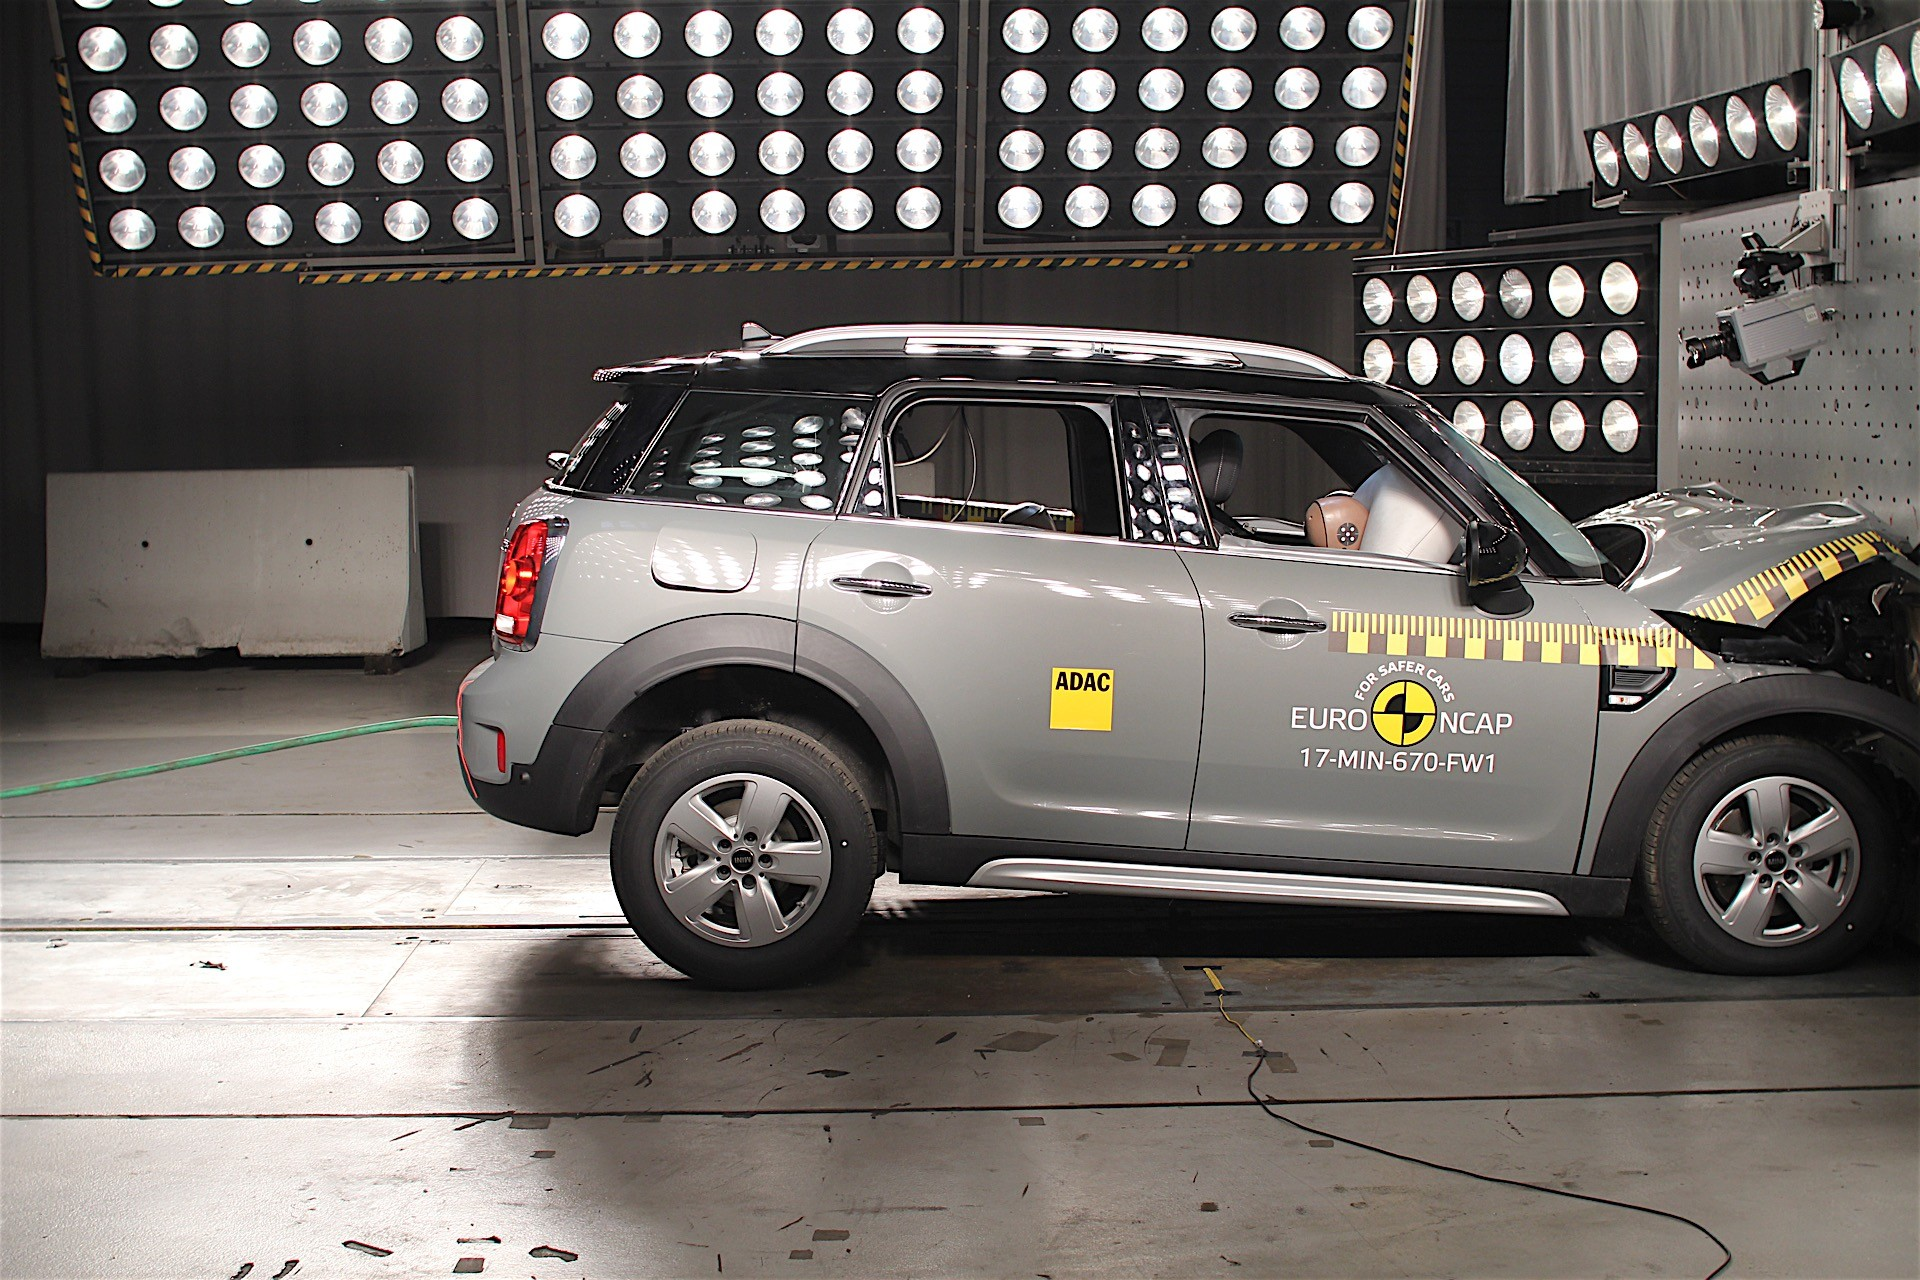 Euro NCAP crash tests may 2017 (23)